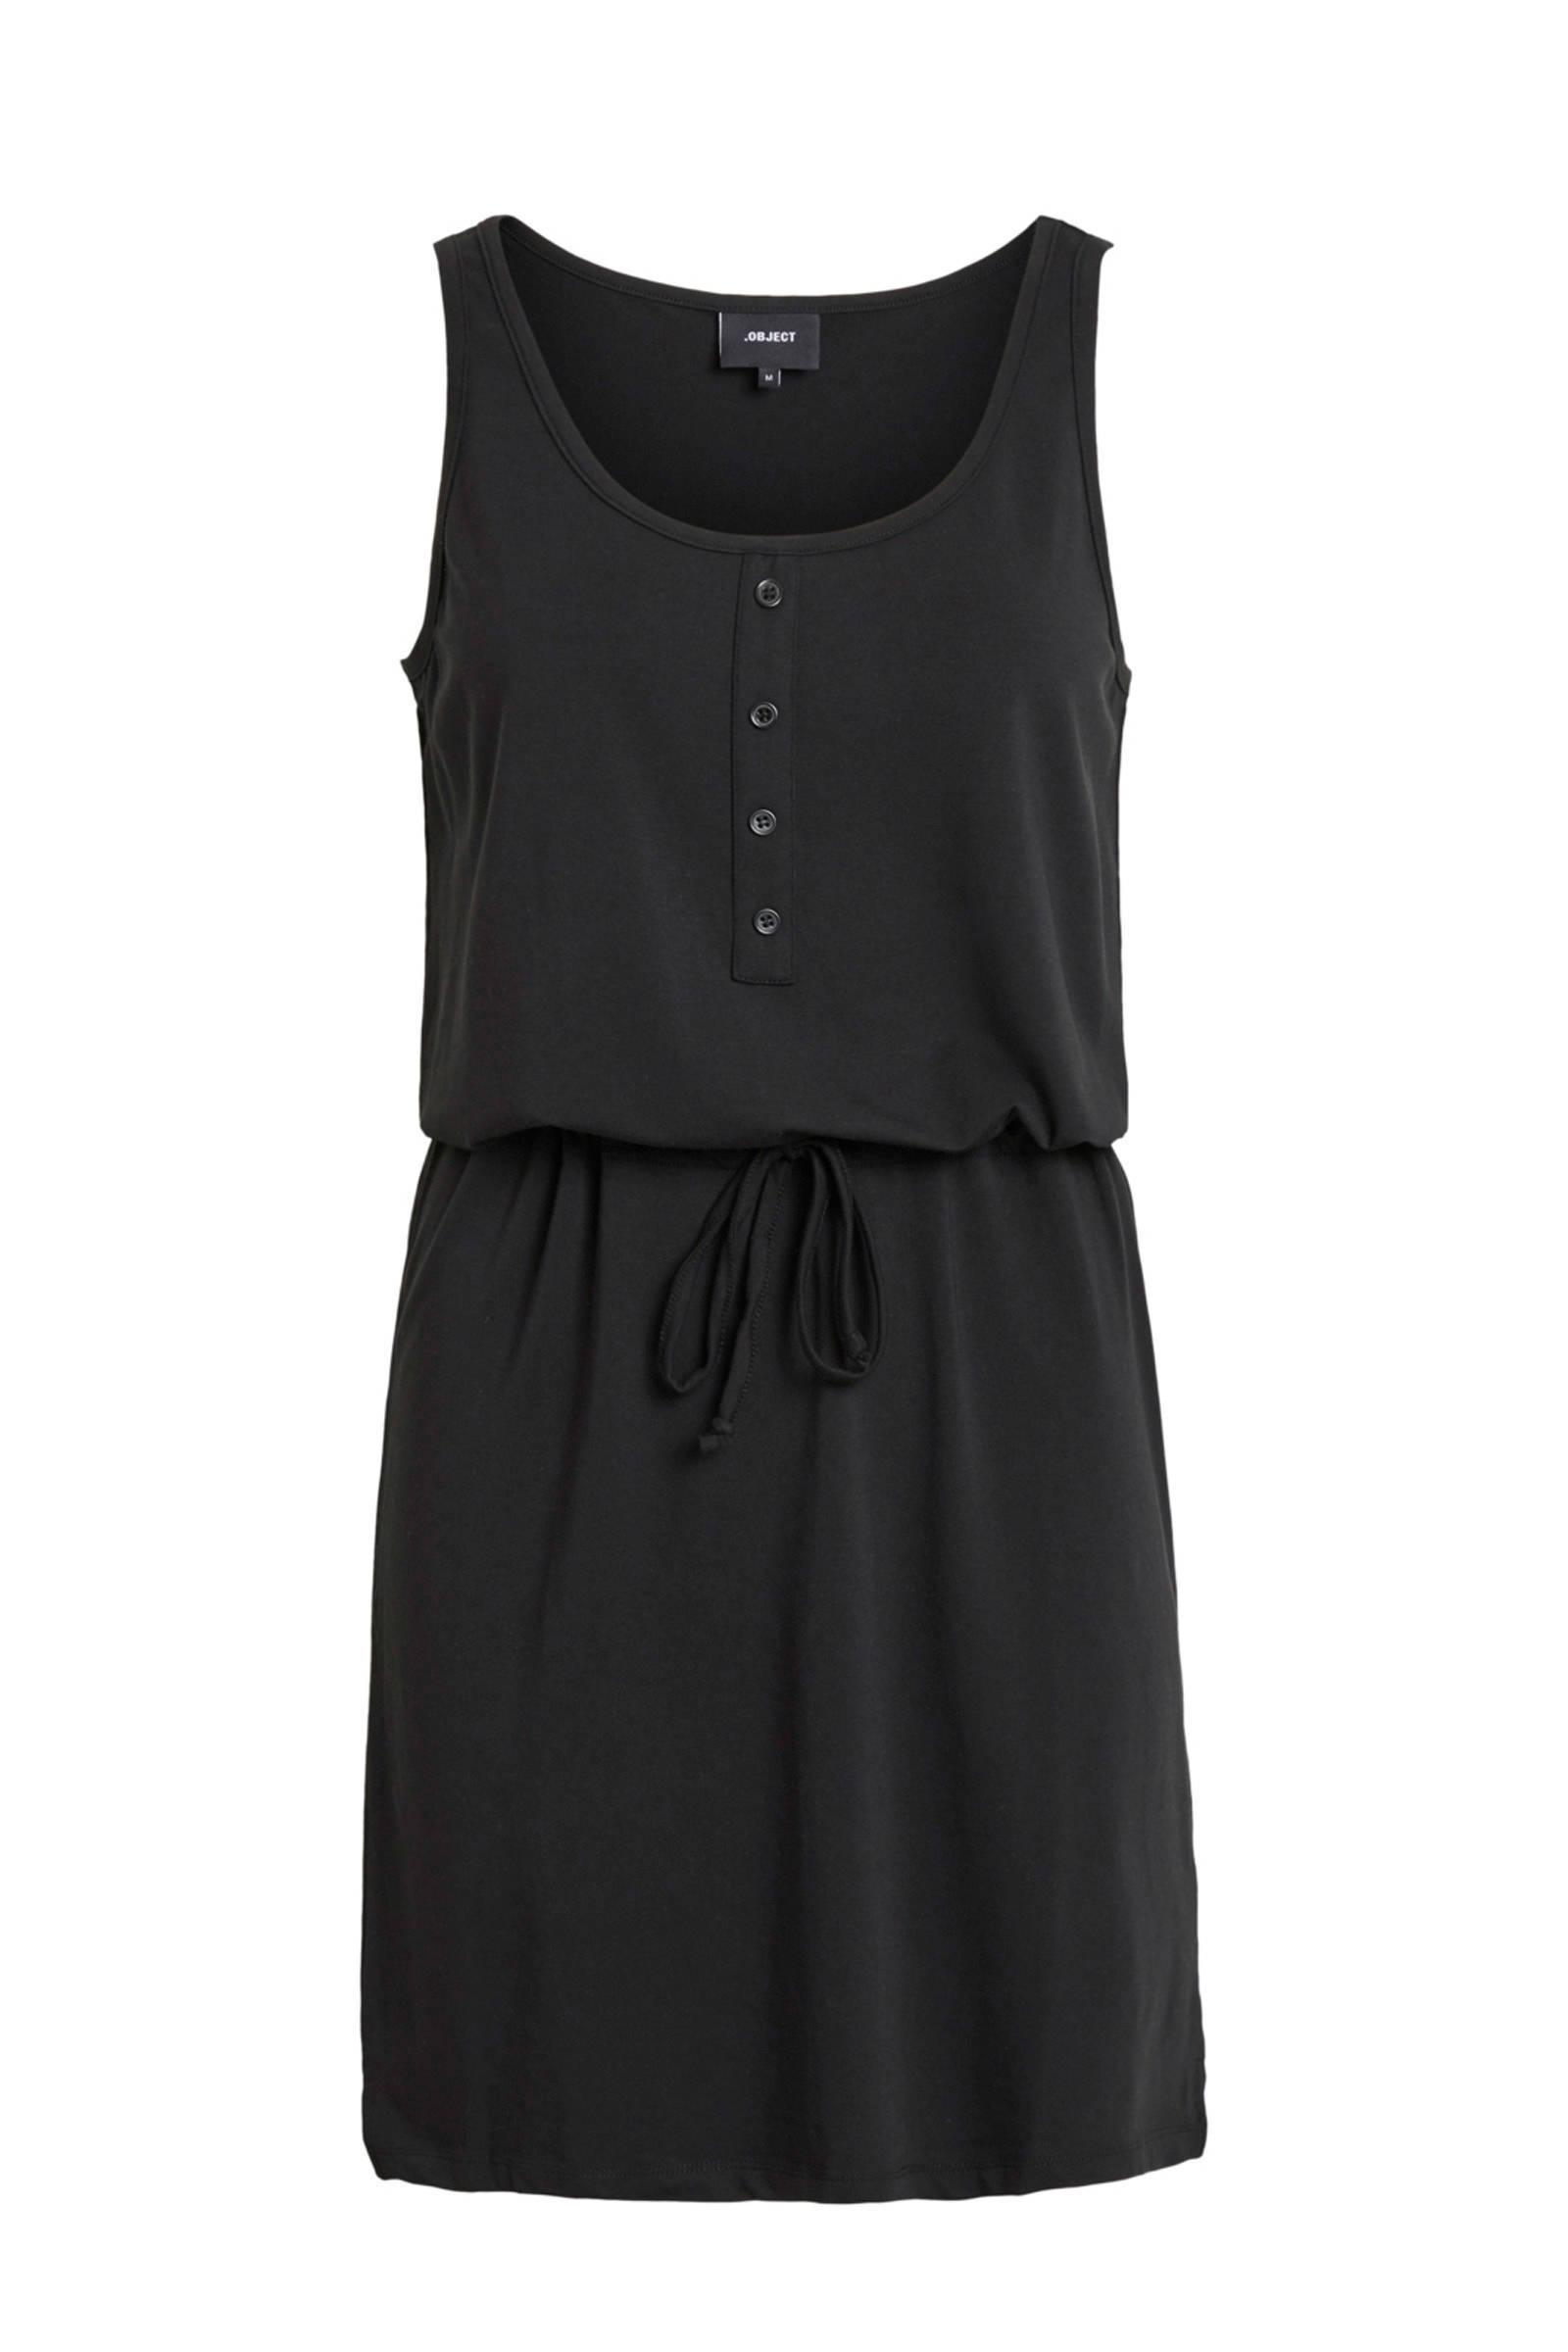 wehkamp object jurk